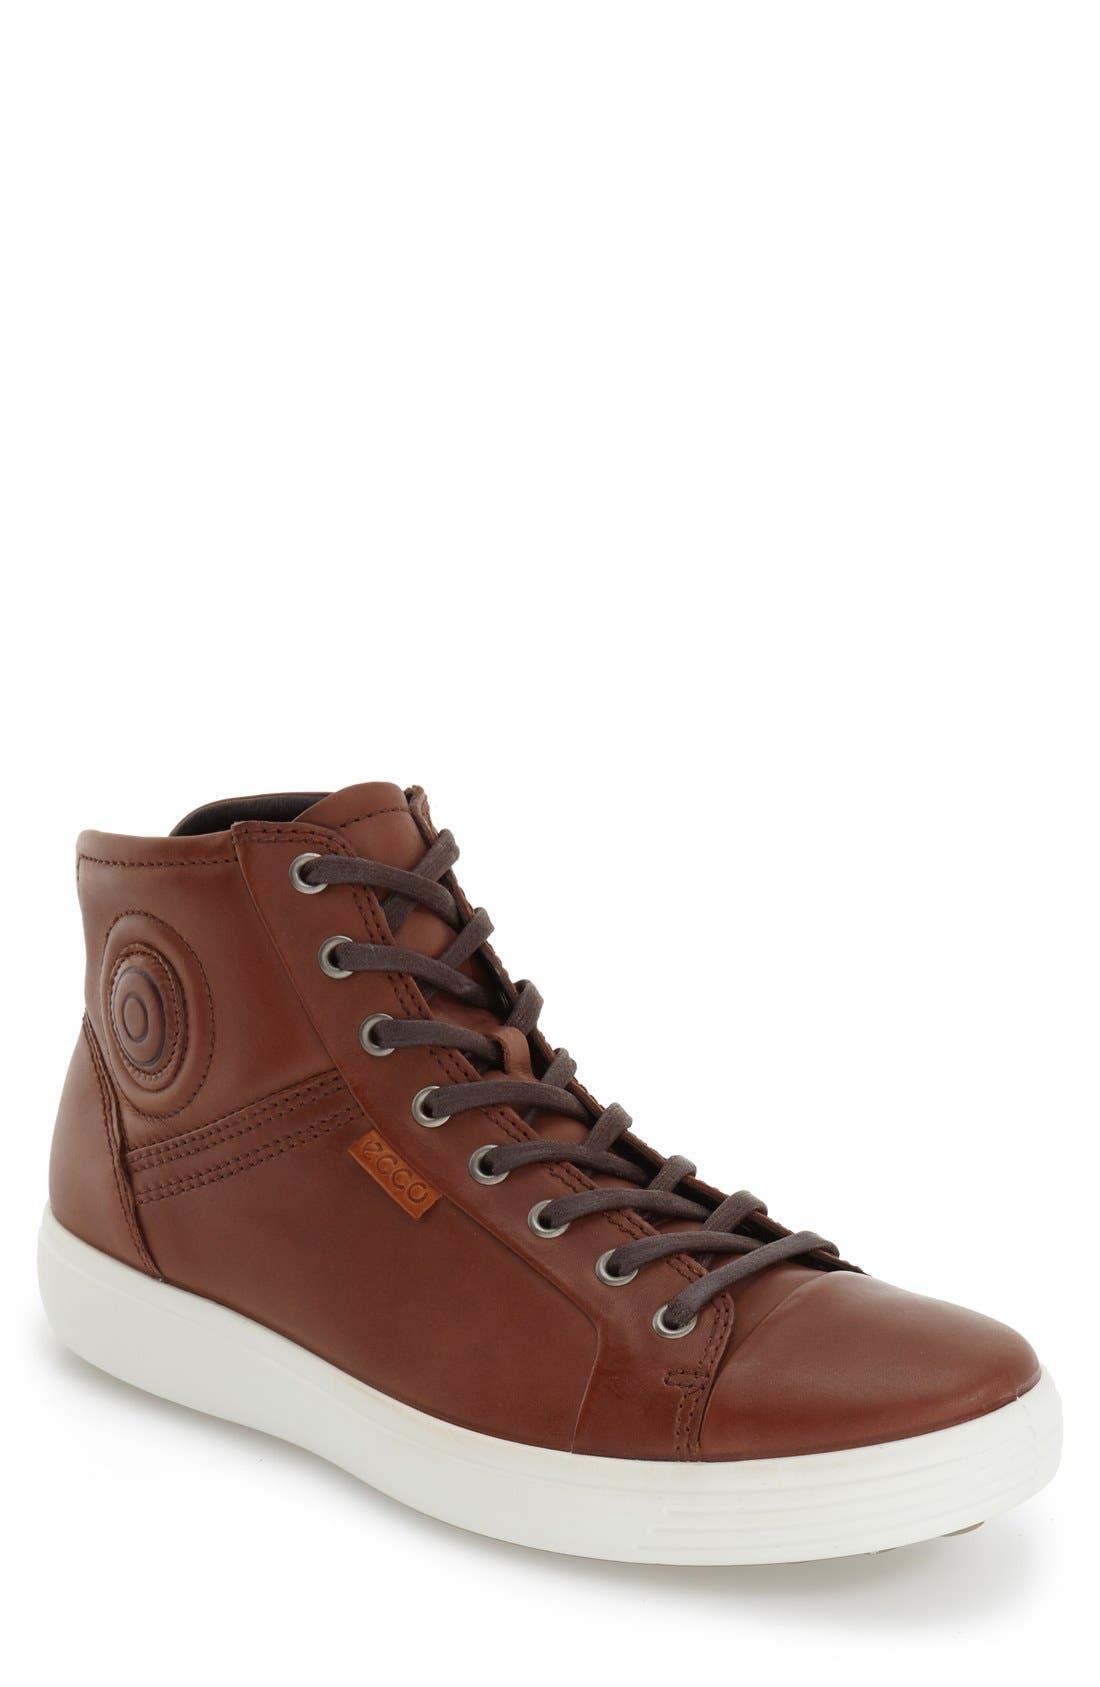 Alternate Image 1 Selected - ECCO 'Soft 7' High Top Sneaker (Men)